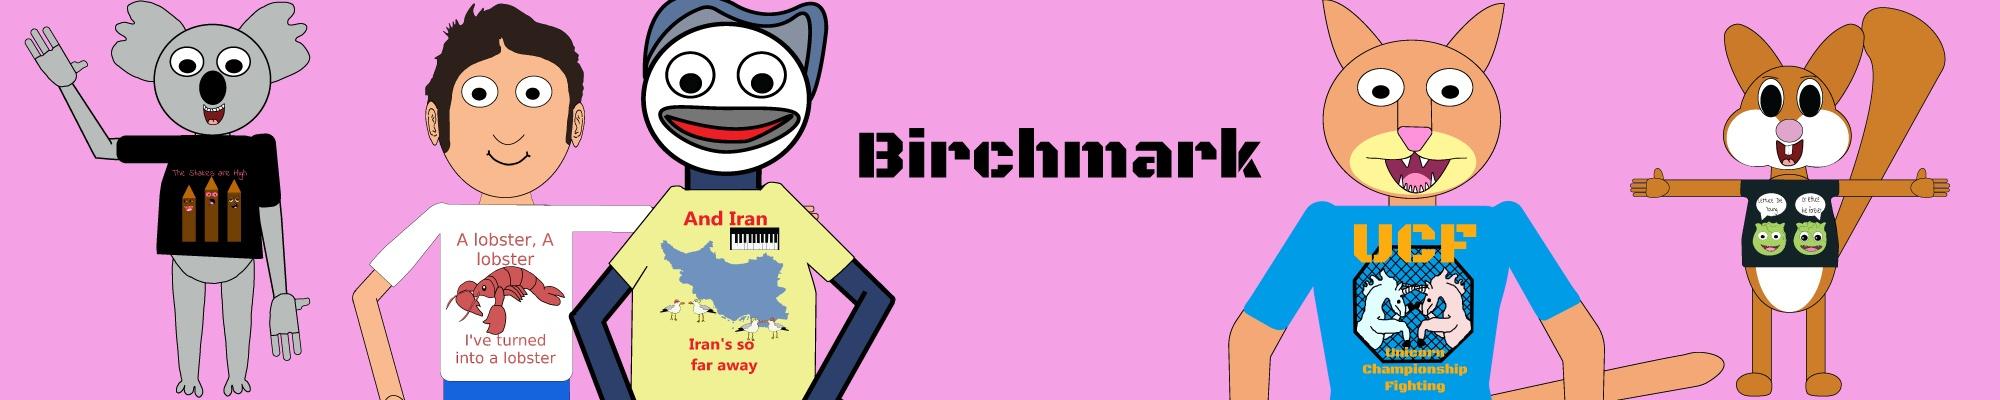 birchmark Cover